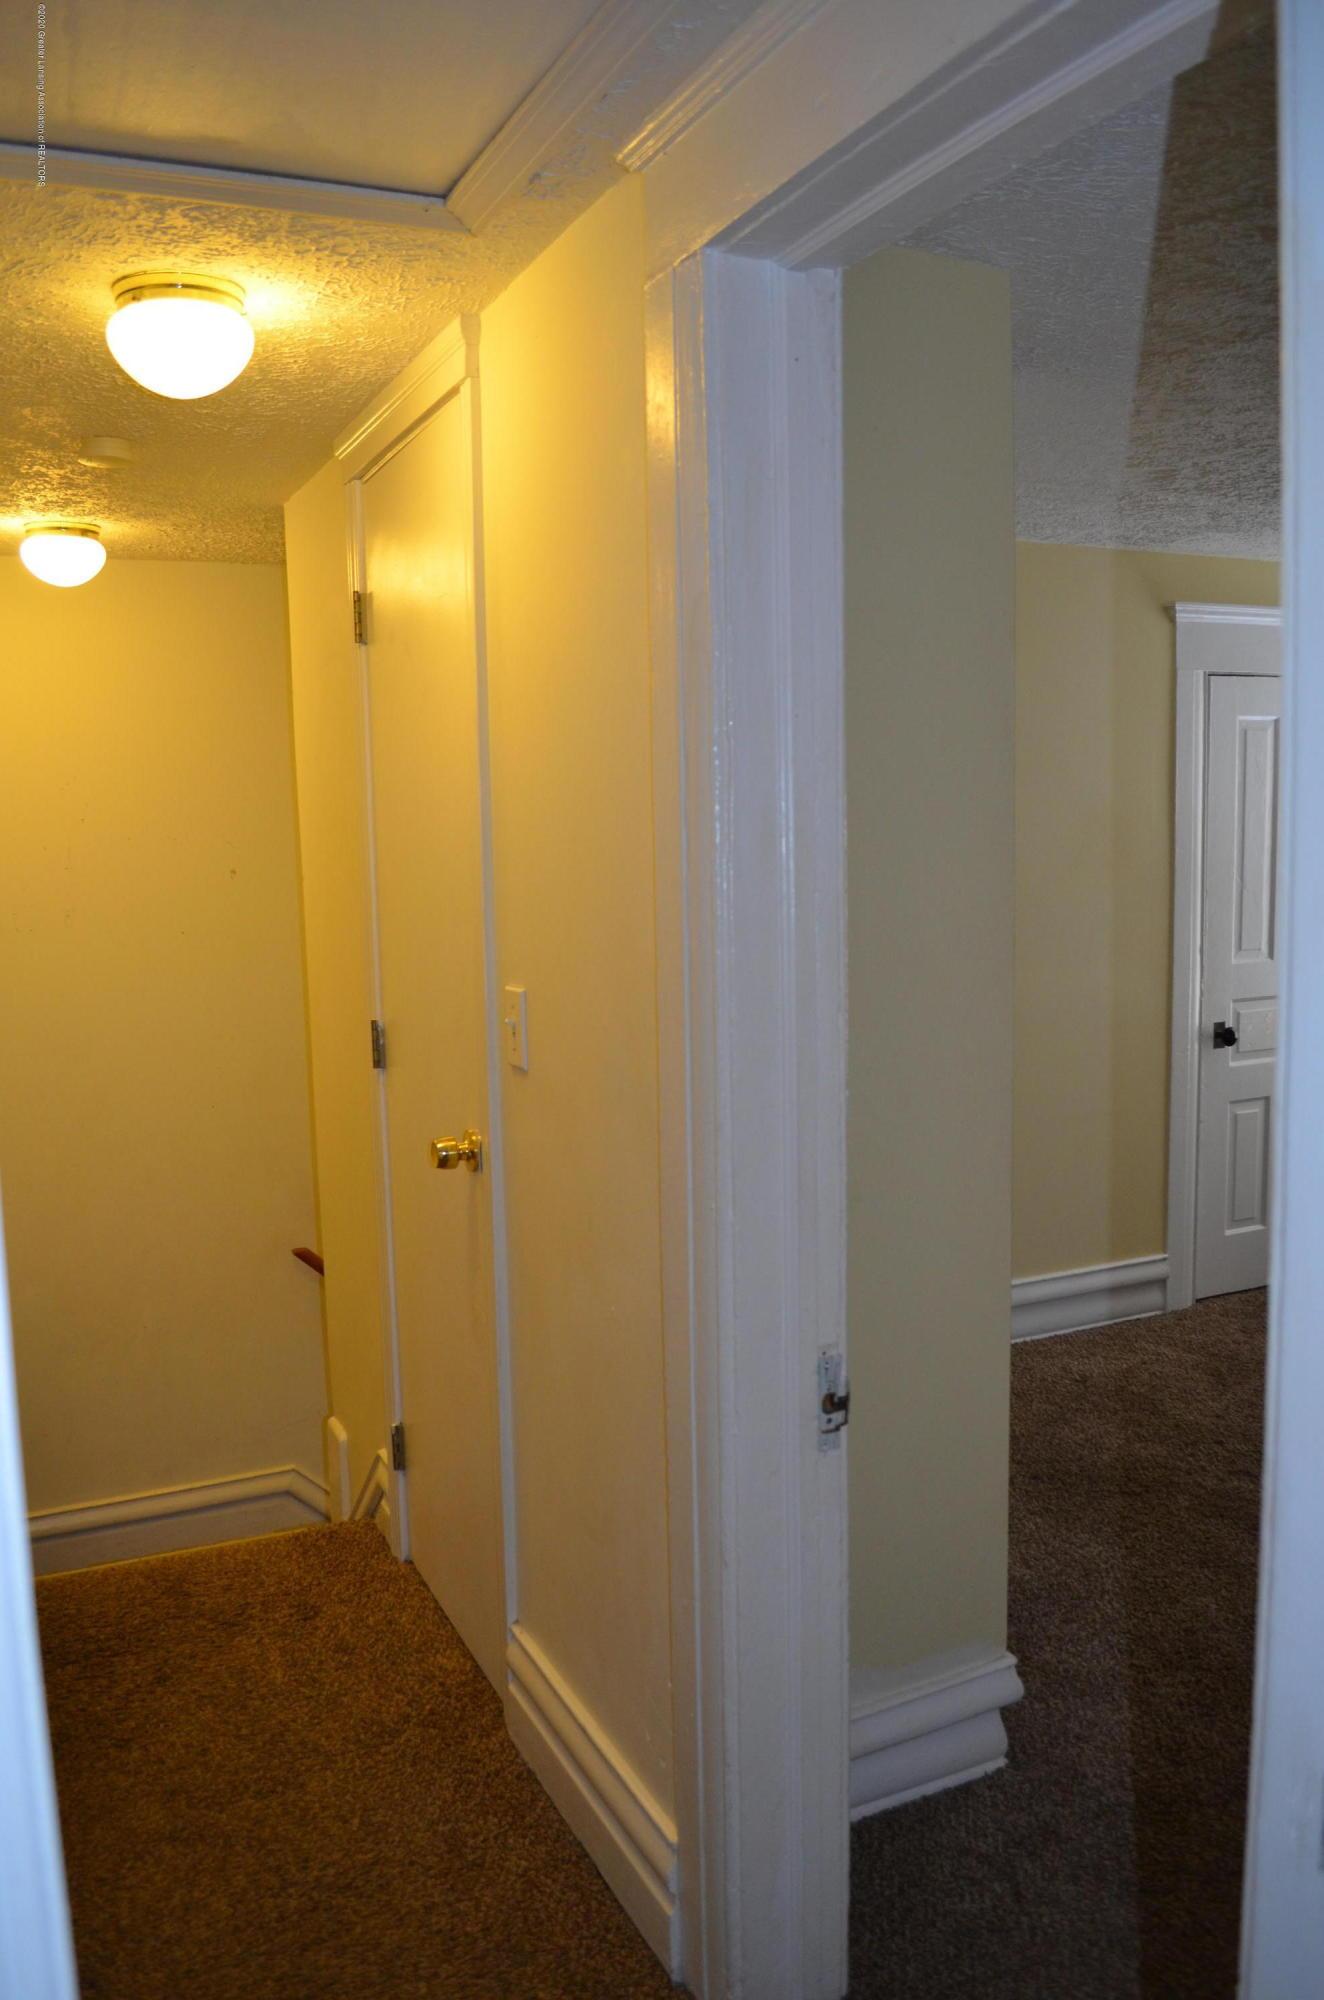 1222 W Ionia St - 2nd Floor Hallway - 22